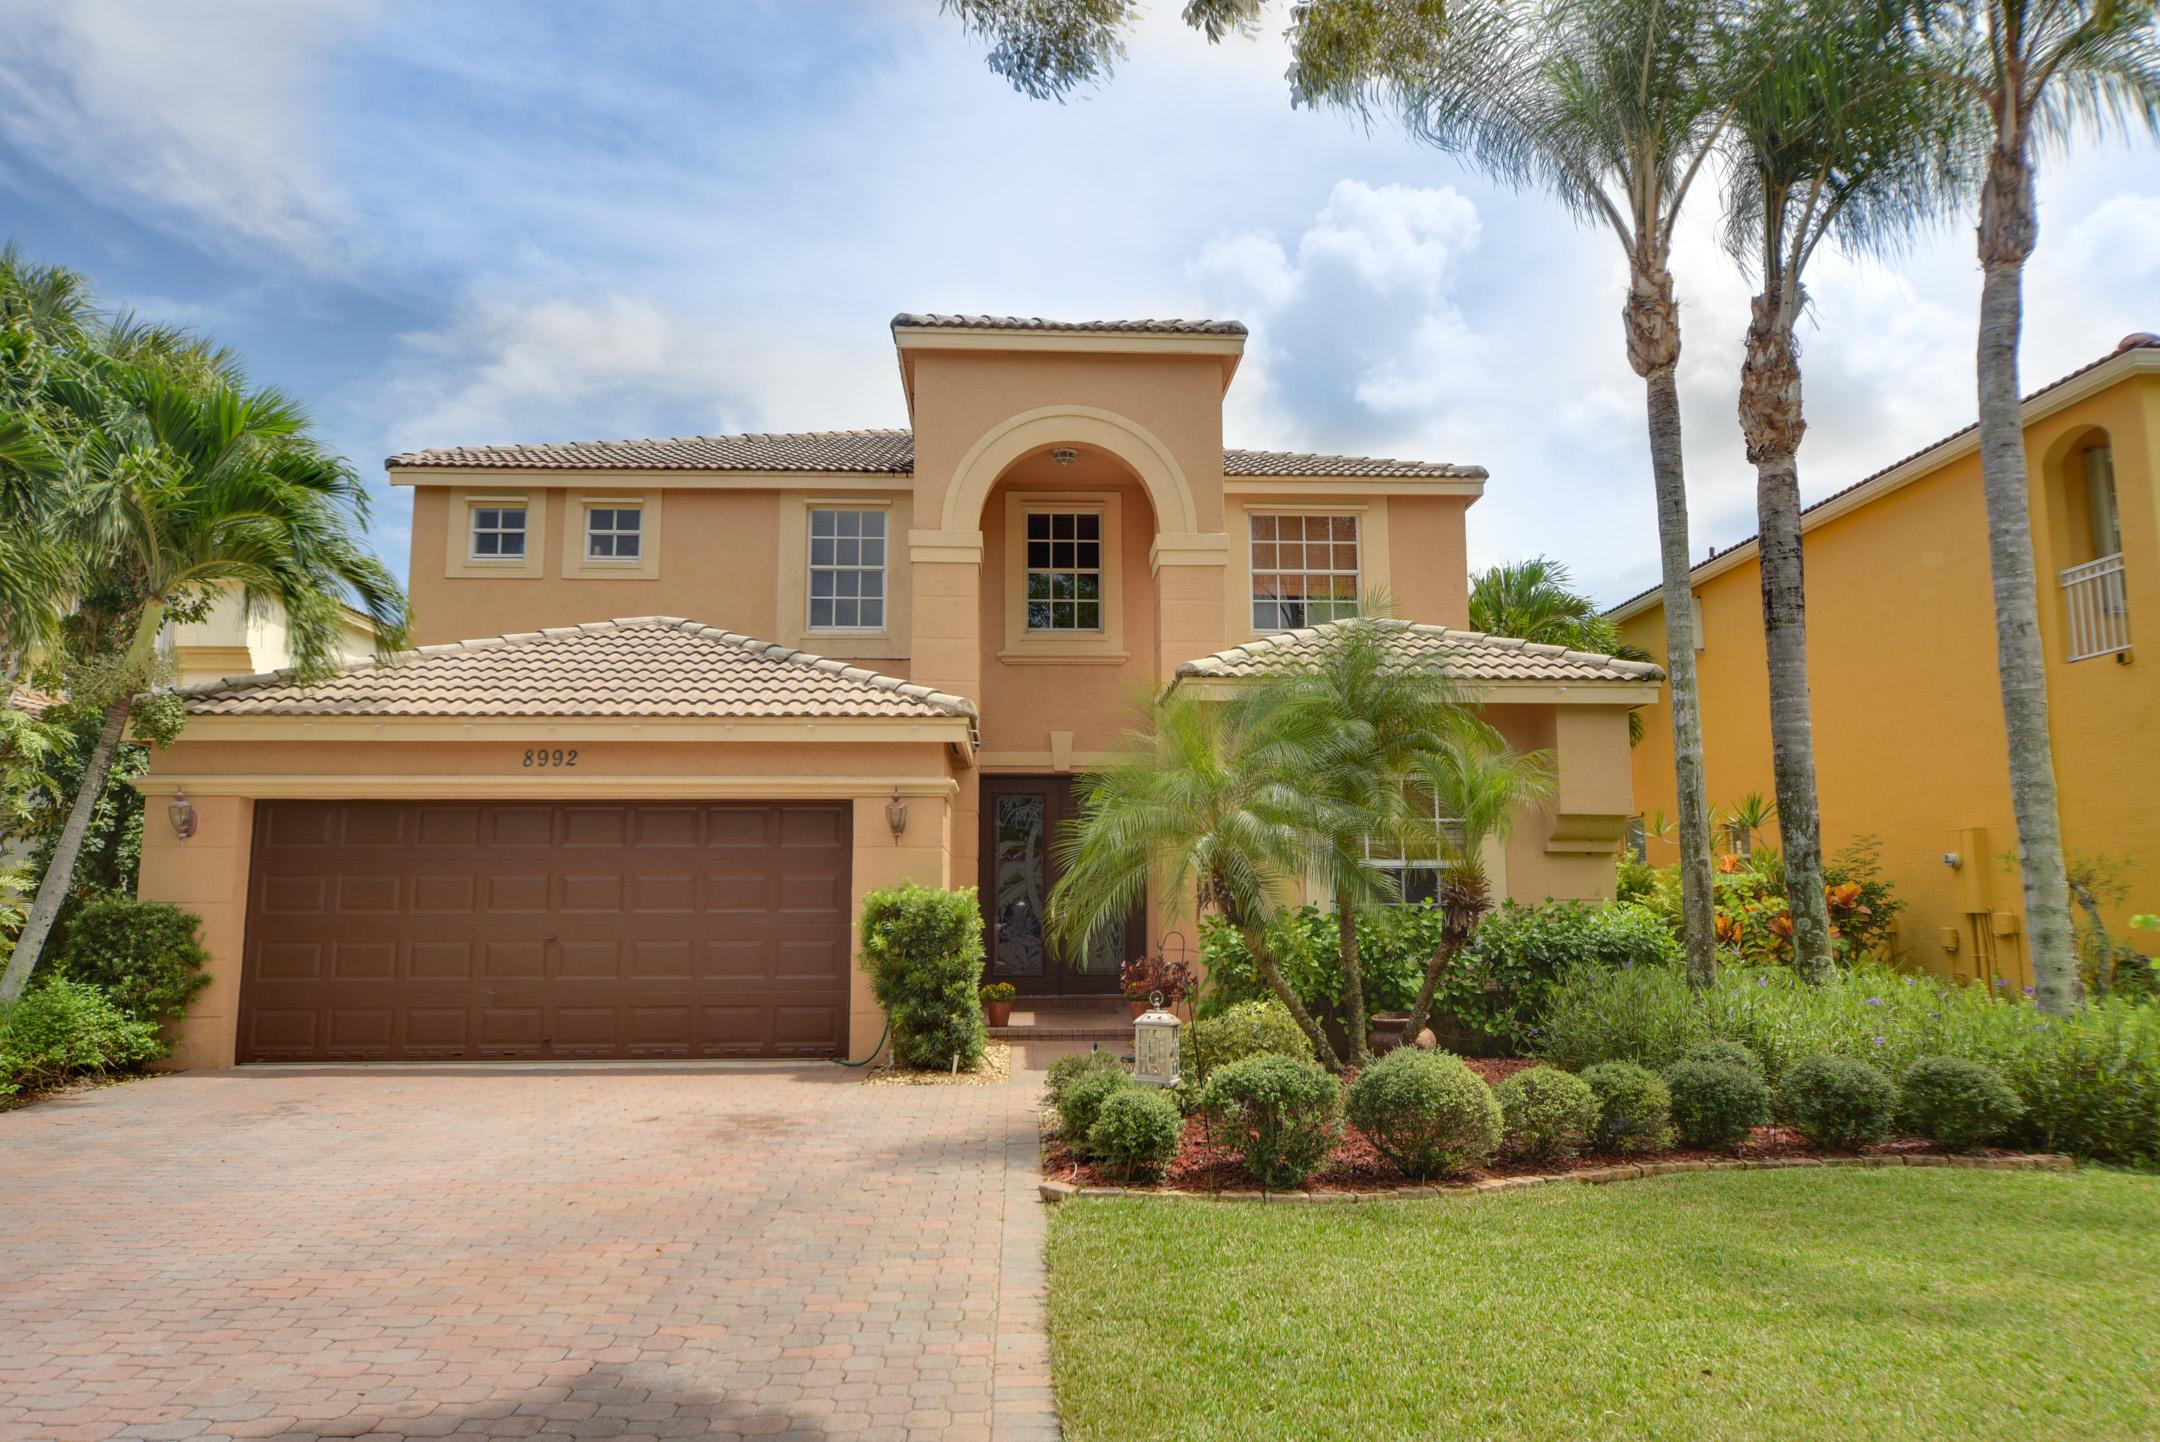 8992 Biddle Court, Wellington, Florida 33414, 5 Bedrooms Bedrooms, ,2.1 BathroomsBathrooms,Single Family,For Sale,Biddle,RX-10504207